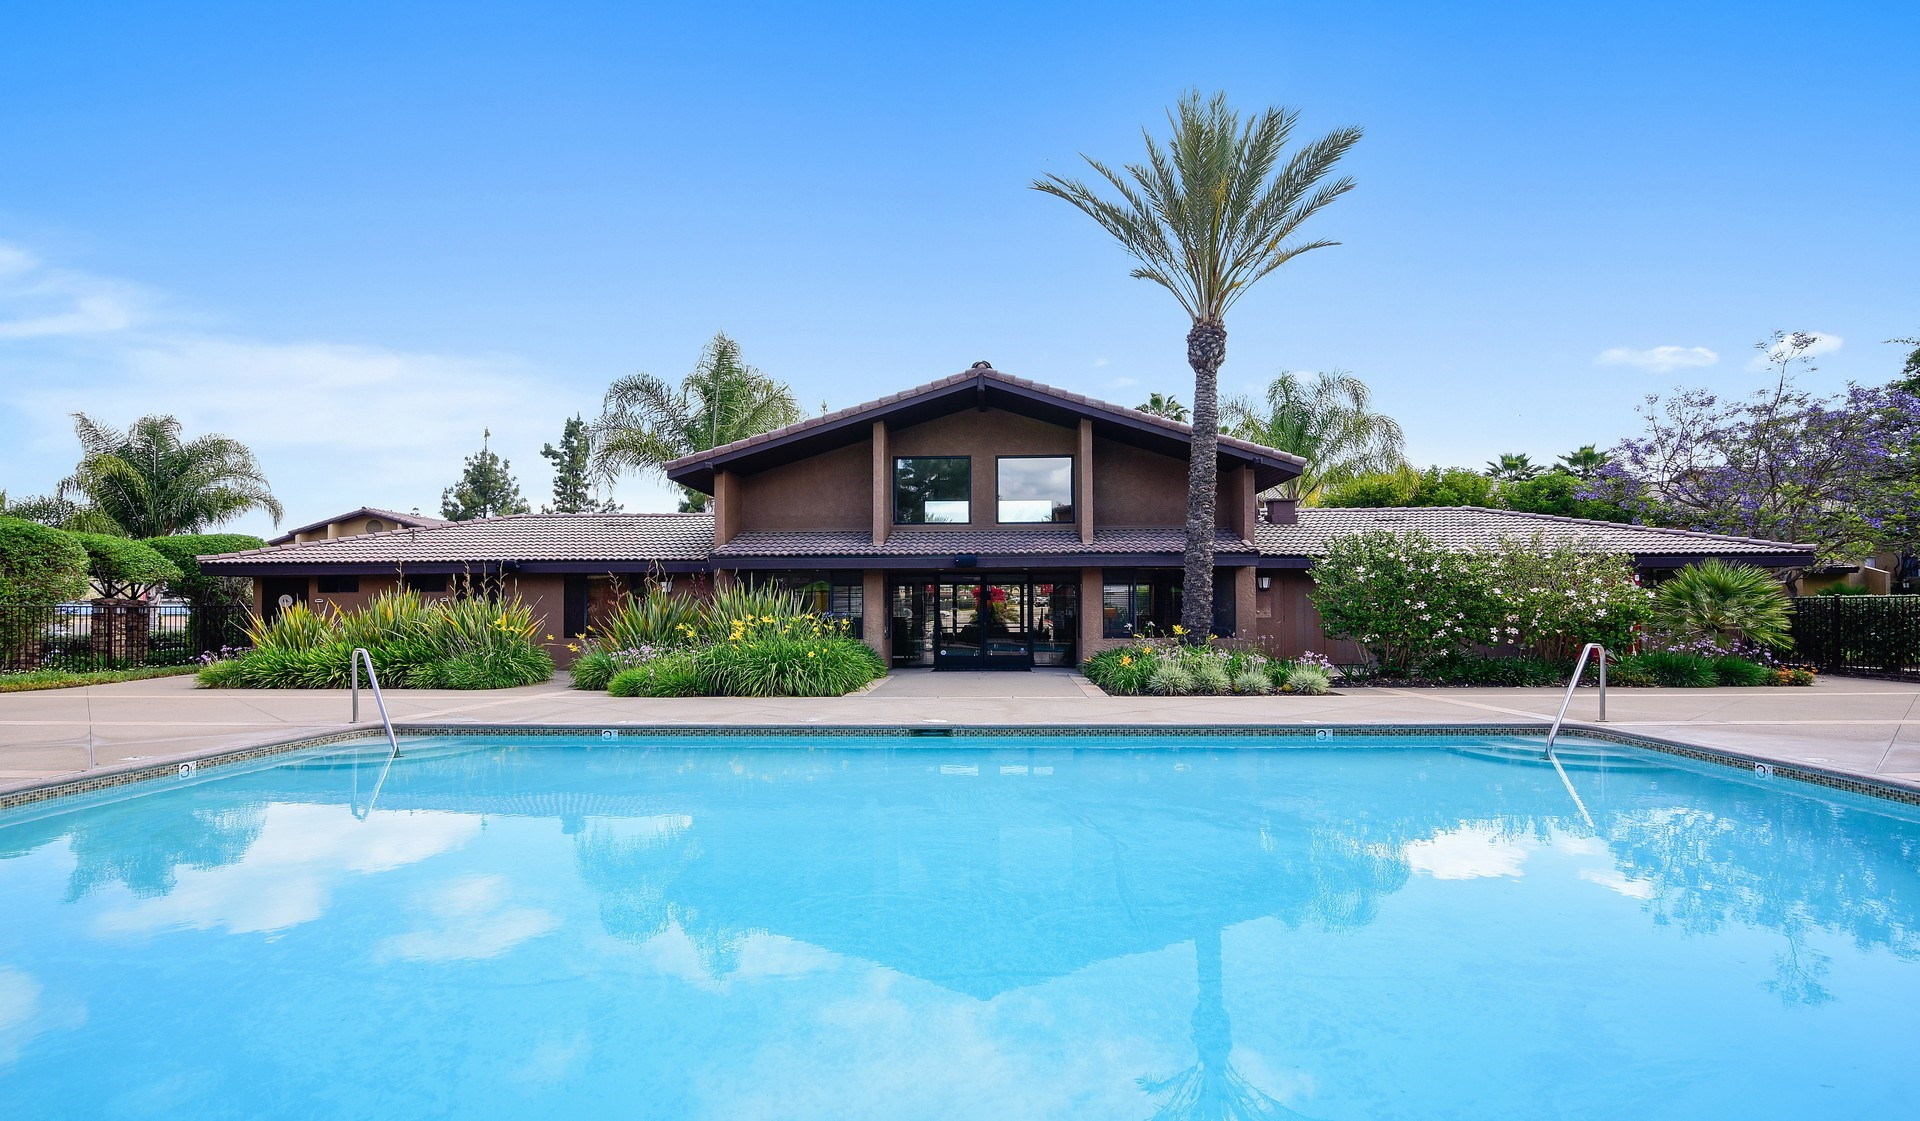 Apartments Near Cal State San Marcos Hidden Cove Apartments for Cal State San Marcos Students in San Marcos, CA